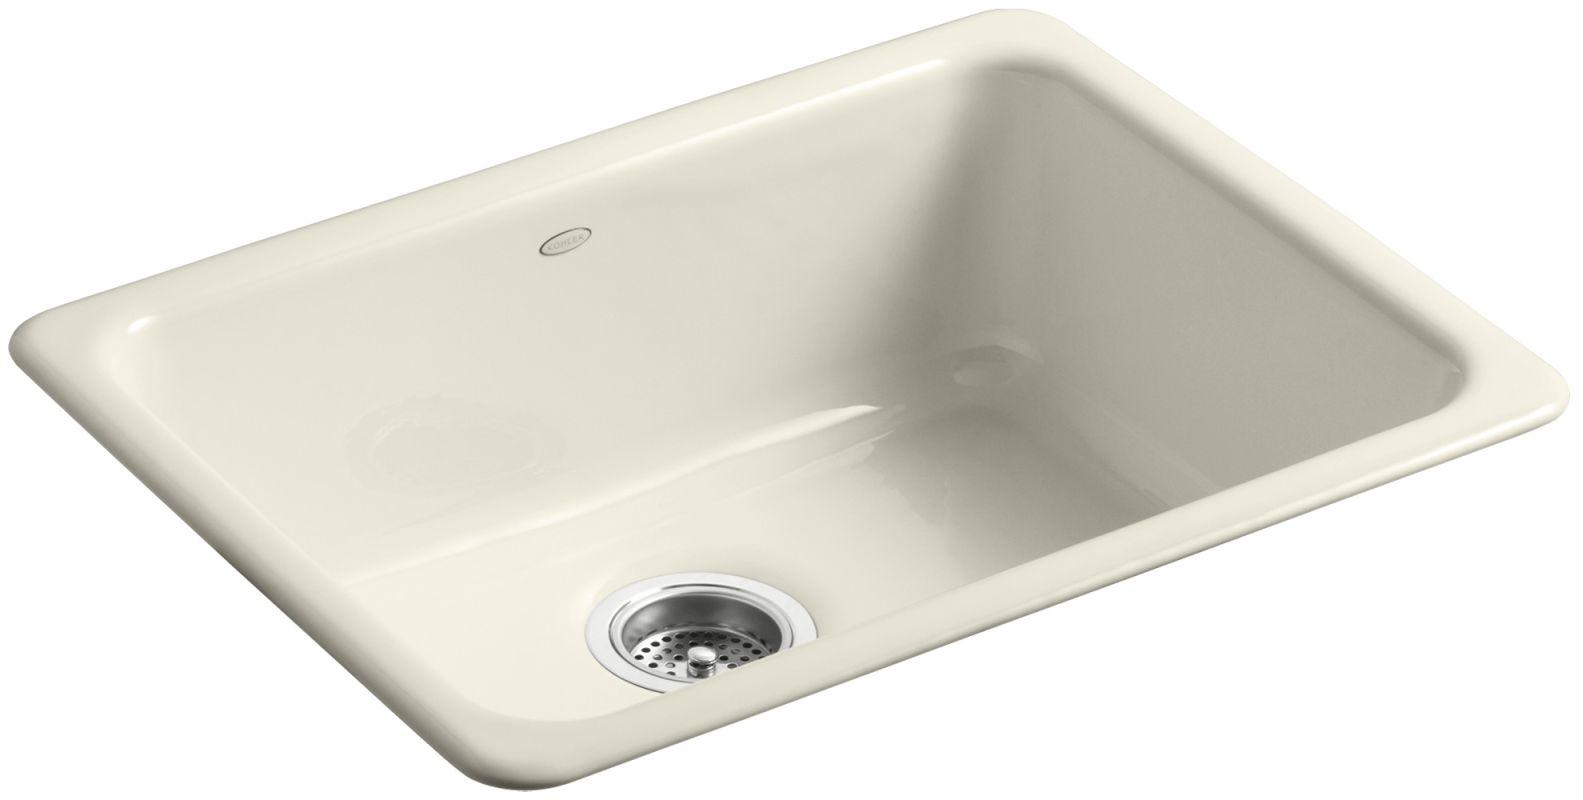 Undermount Kitchen Sink With Faucet Holes Kohler K 6585 47 Almond Iron Tones 24 Quot Single Basin Top